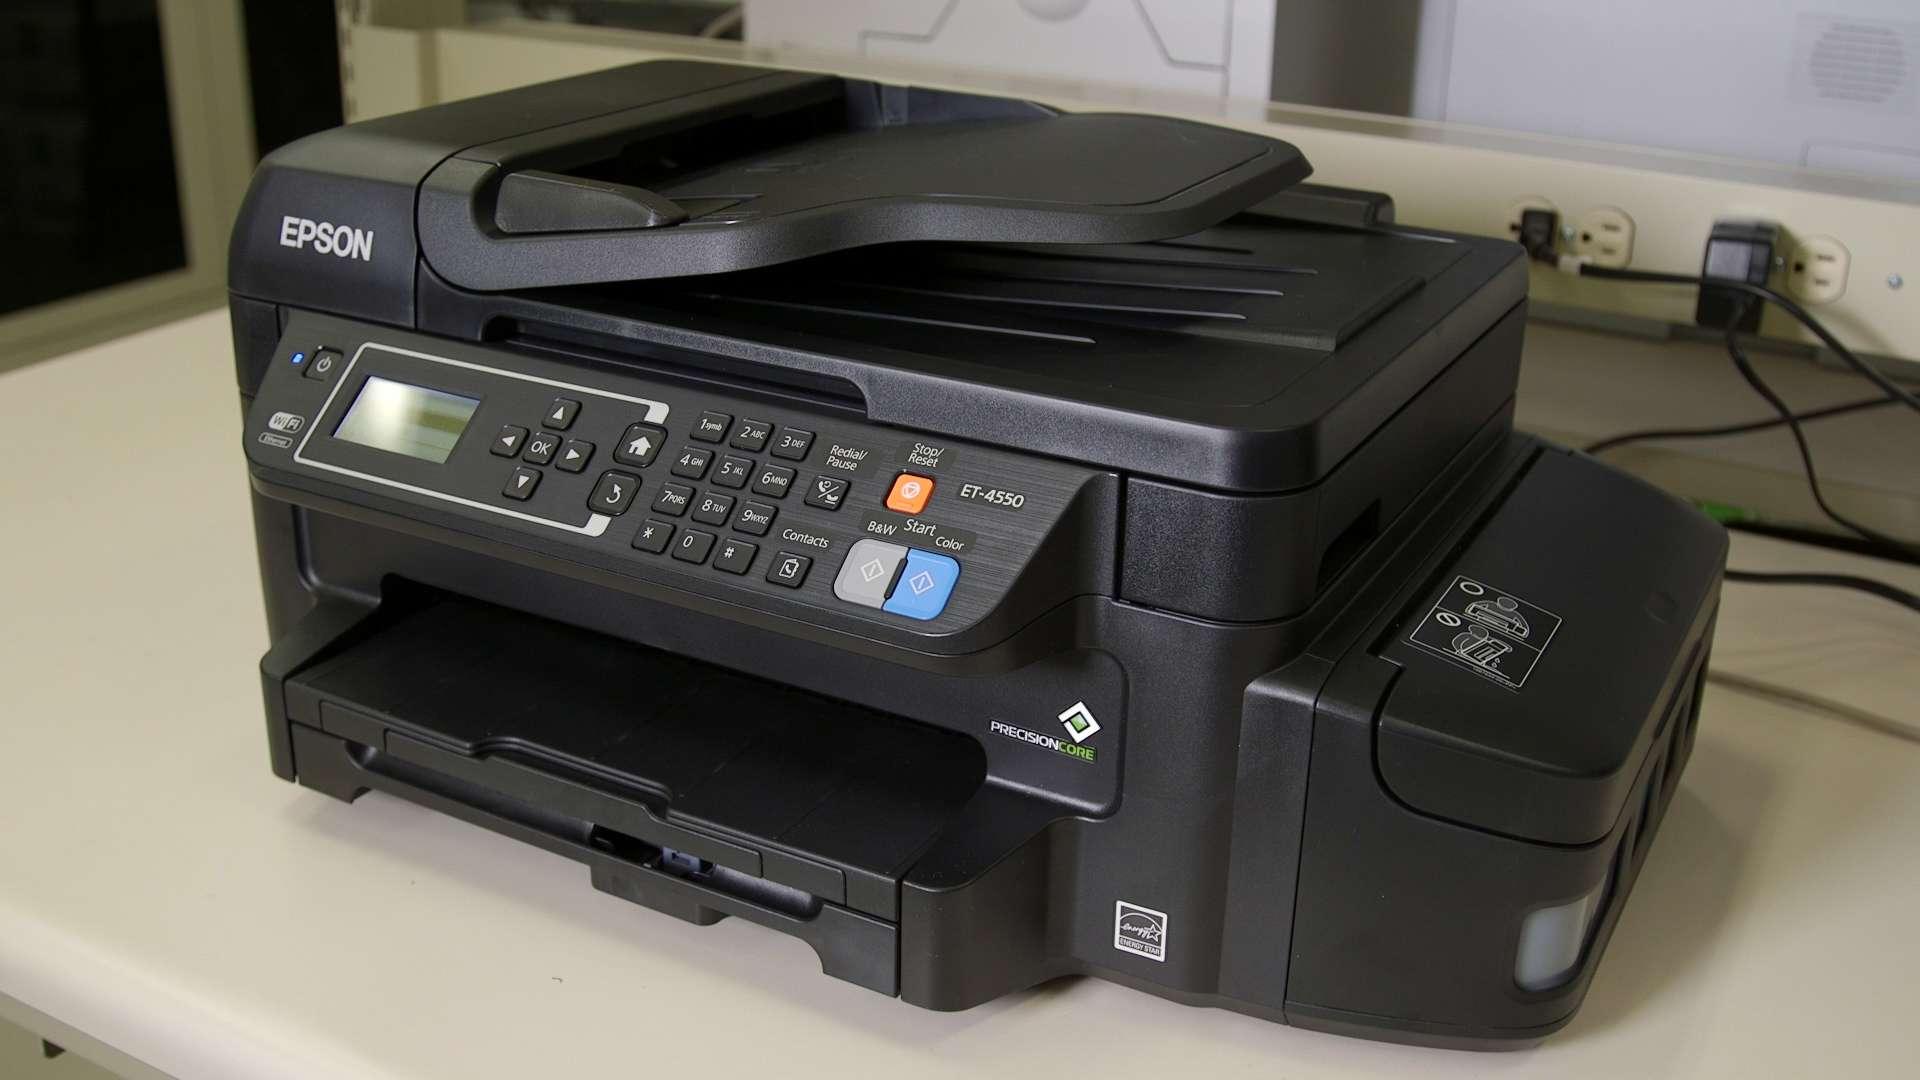 Epson Printer Error Code 0x9d - How to fix